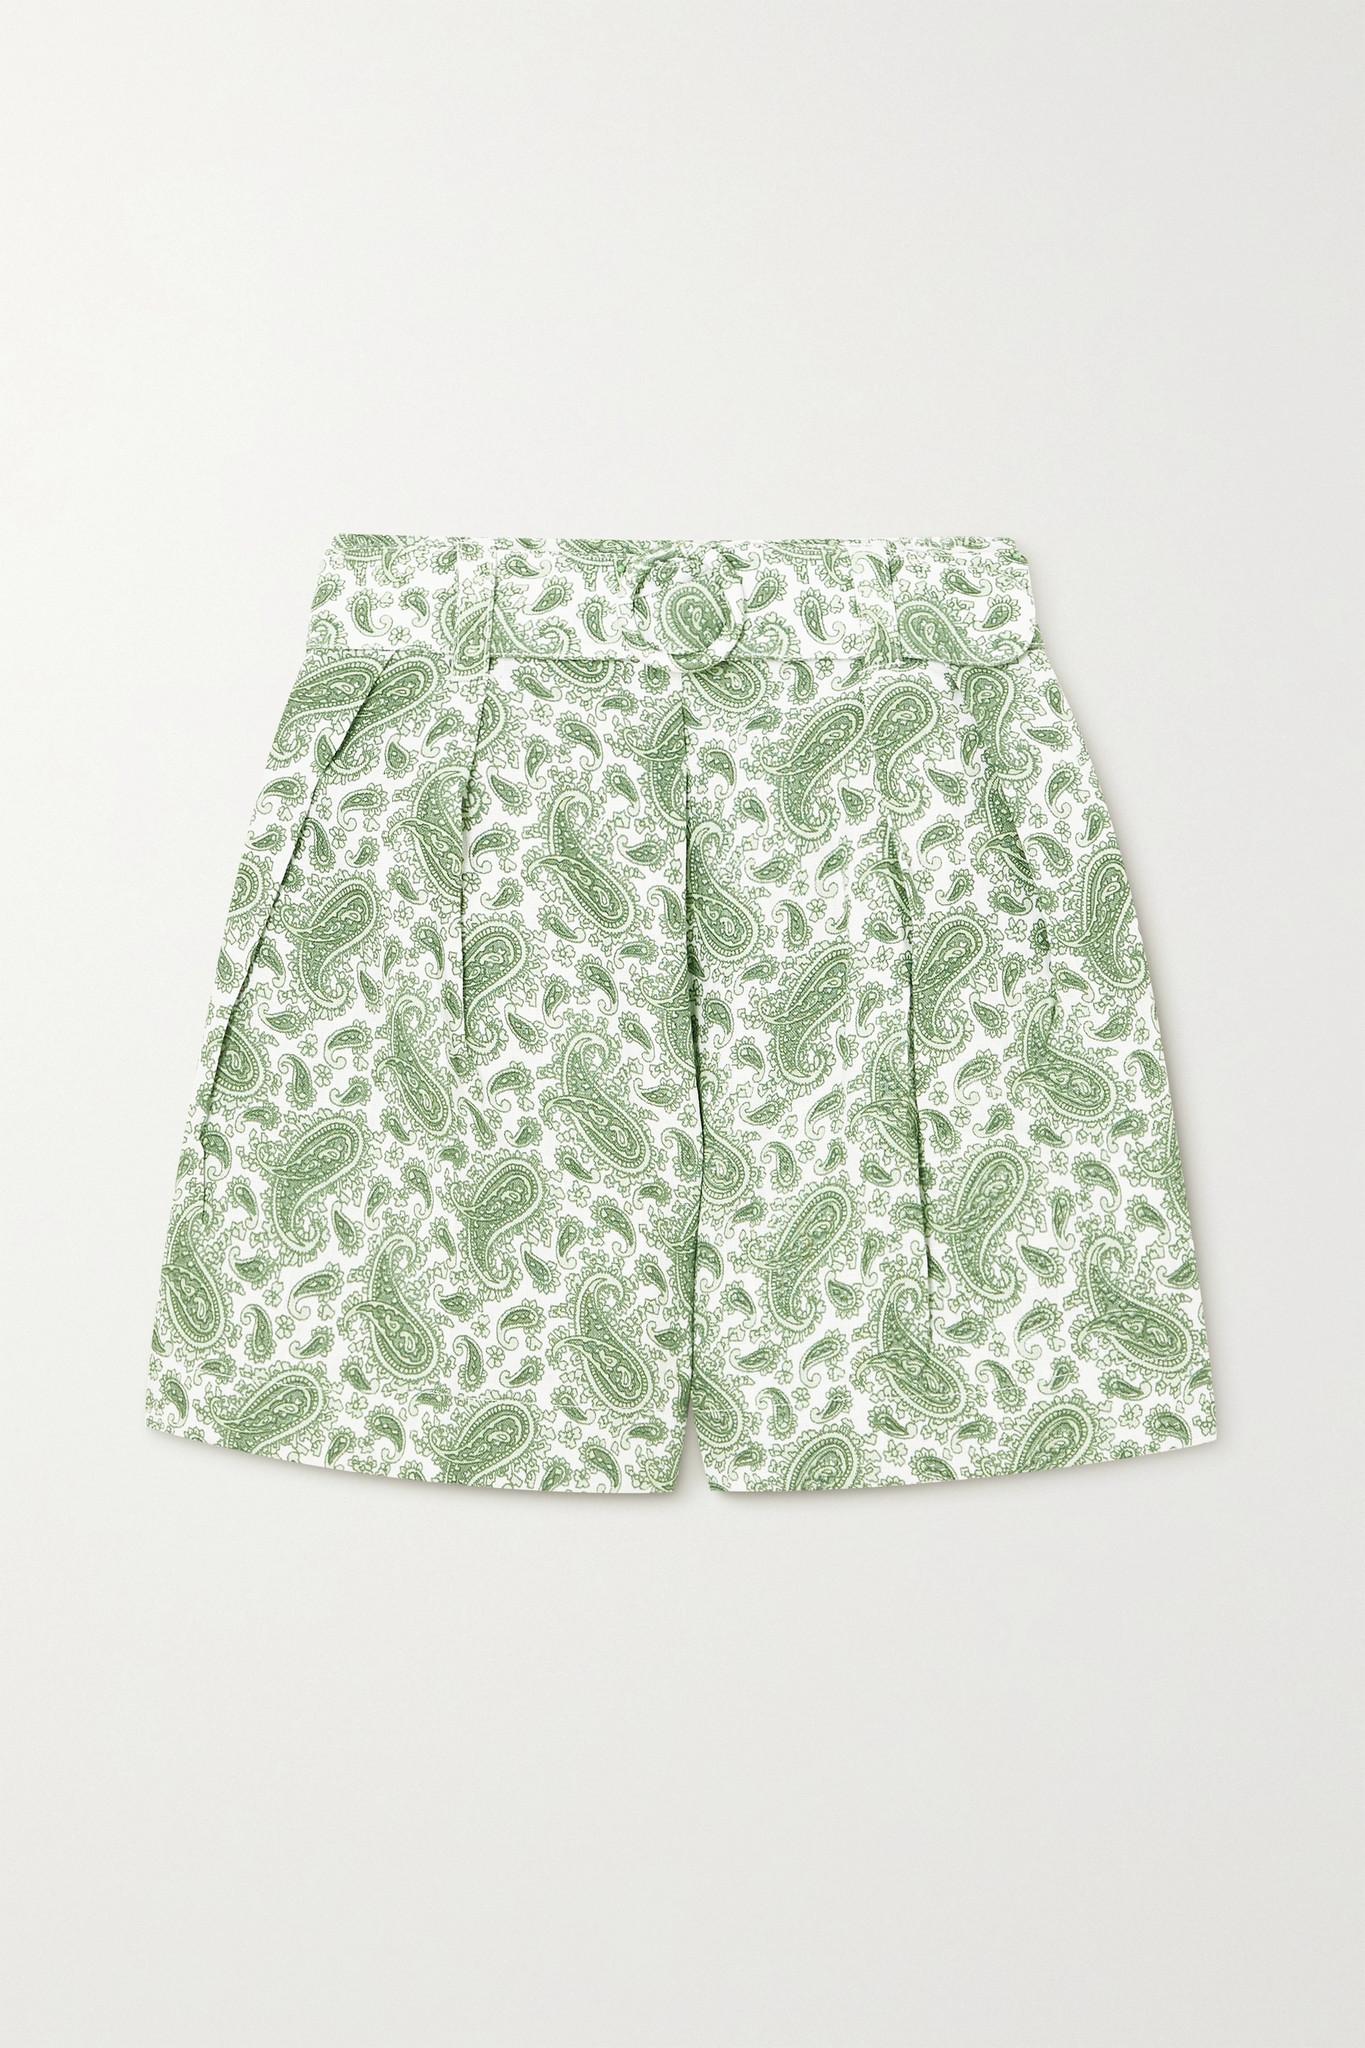 FAITHFULL THE BRAND - 【net Sustain】ondine 配腰带佩斯利印花亚麻短裤 - 绿色 - large